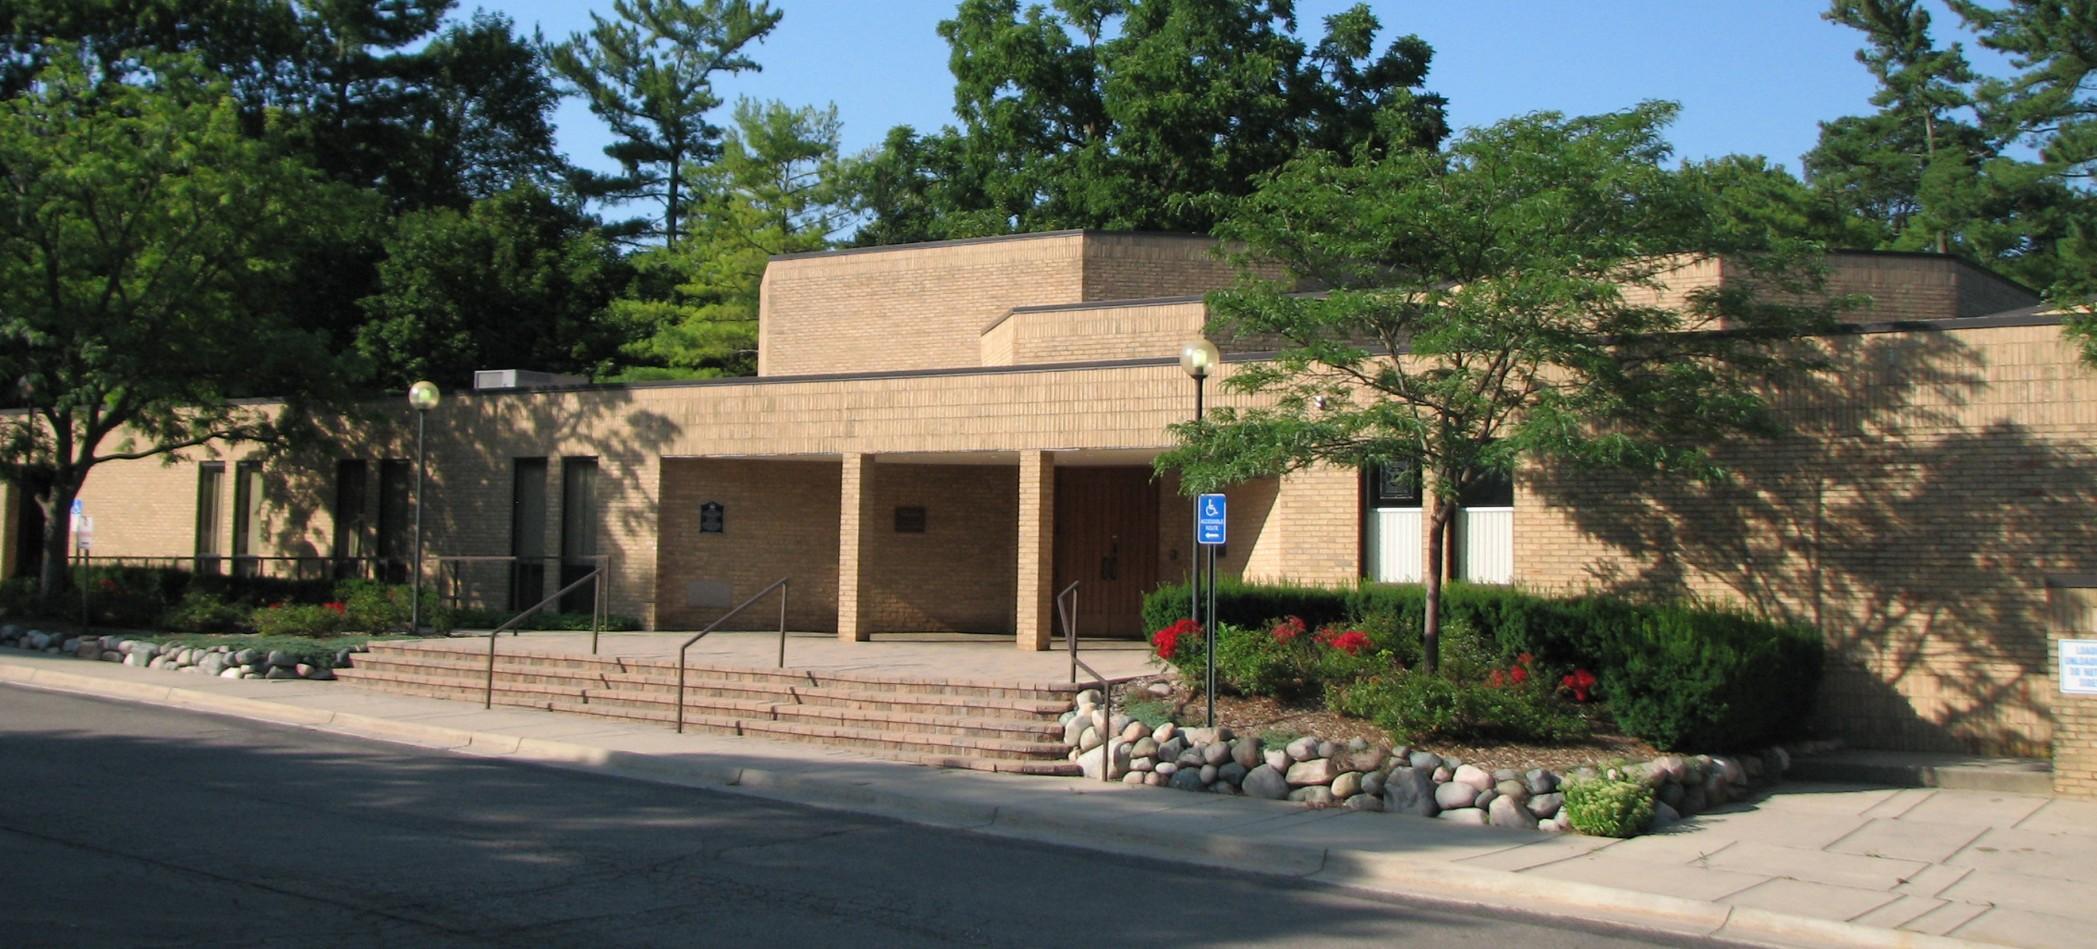 "<span class=""slider_title"">                                     Beth Israel Congregation                                </span>"